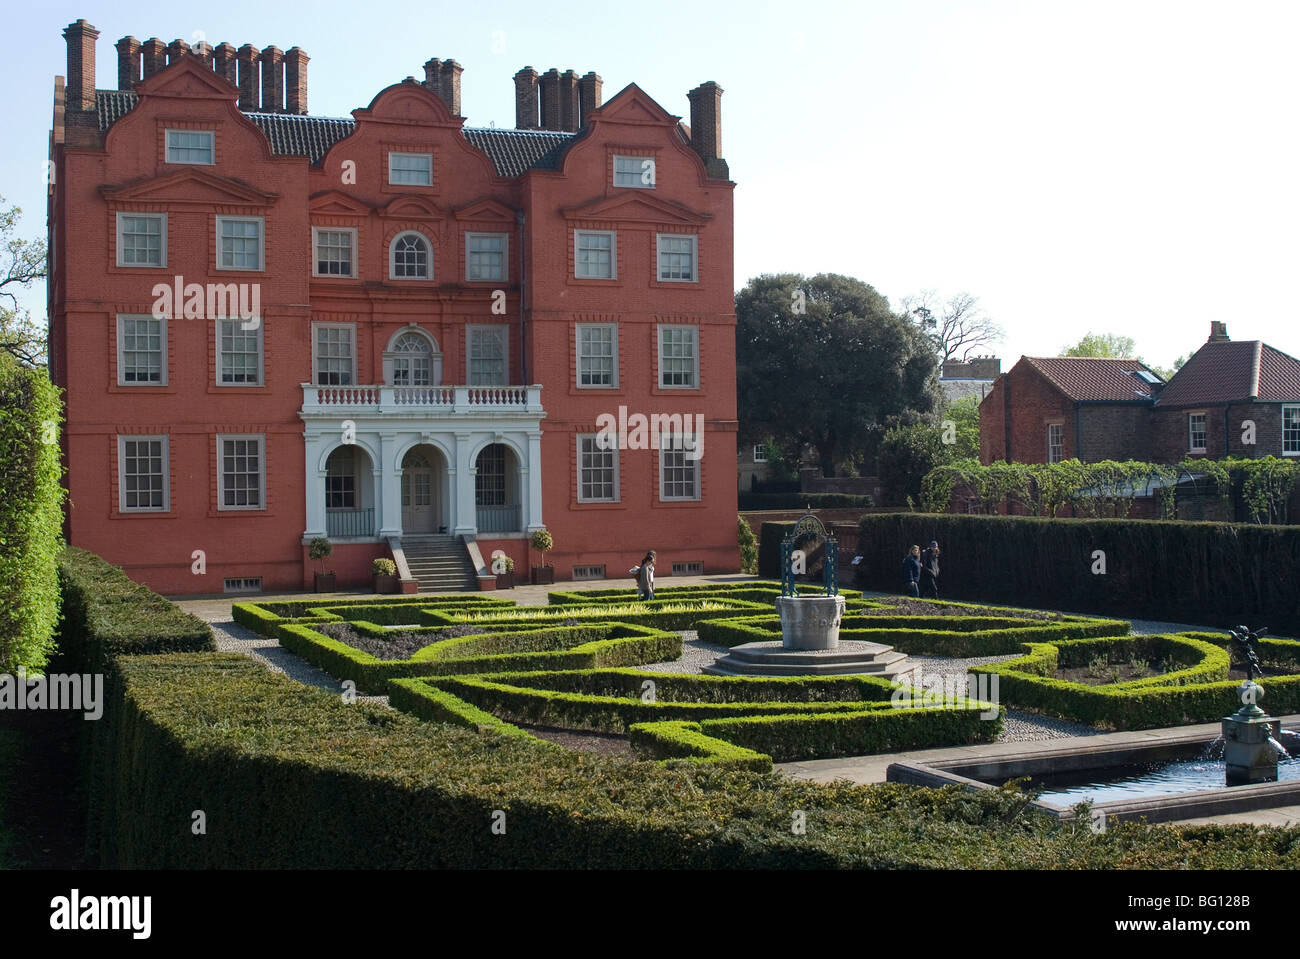 Kew Palace and Queen's Garden, Royal Botanic Gardens (Kew Gardens), Kew, Surrey, England, United Kingdom - Stock Image